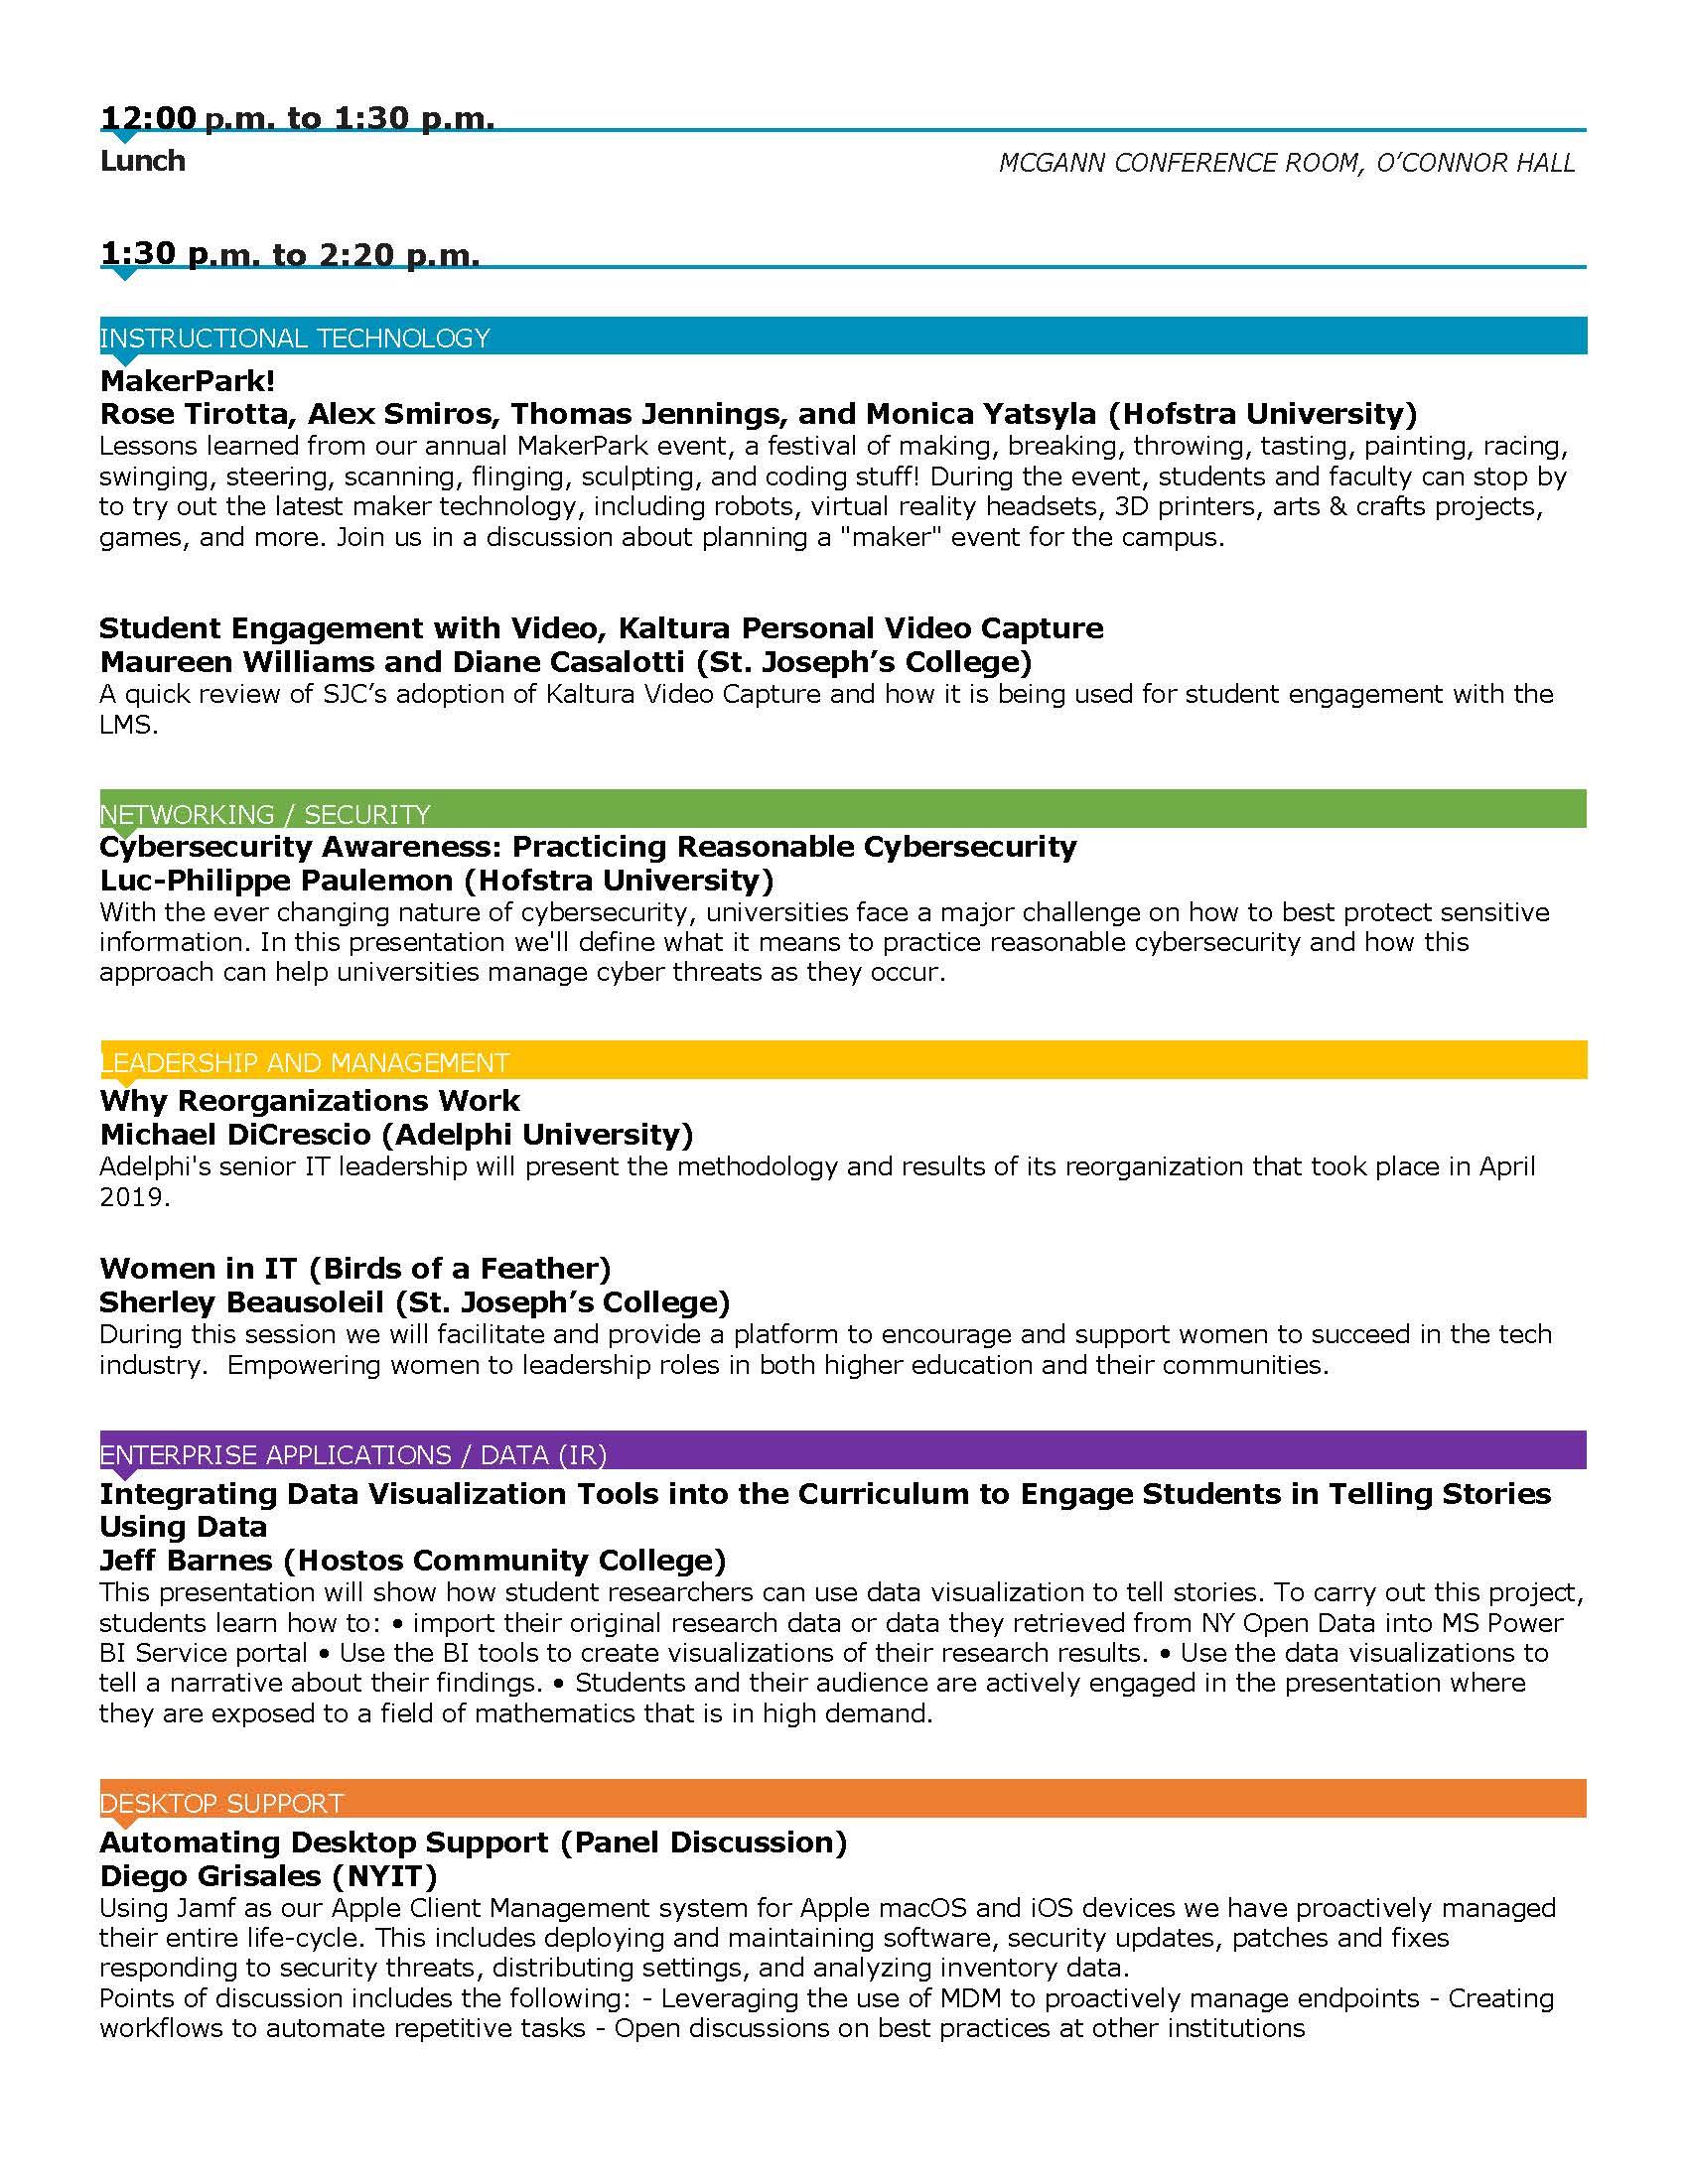 NYHETF 2019 SJC Agenda as of 5-21-19 Page 3.jpg